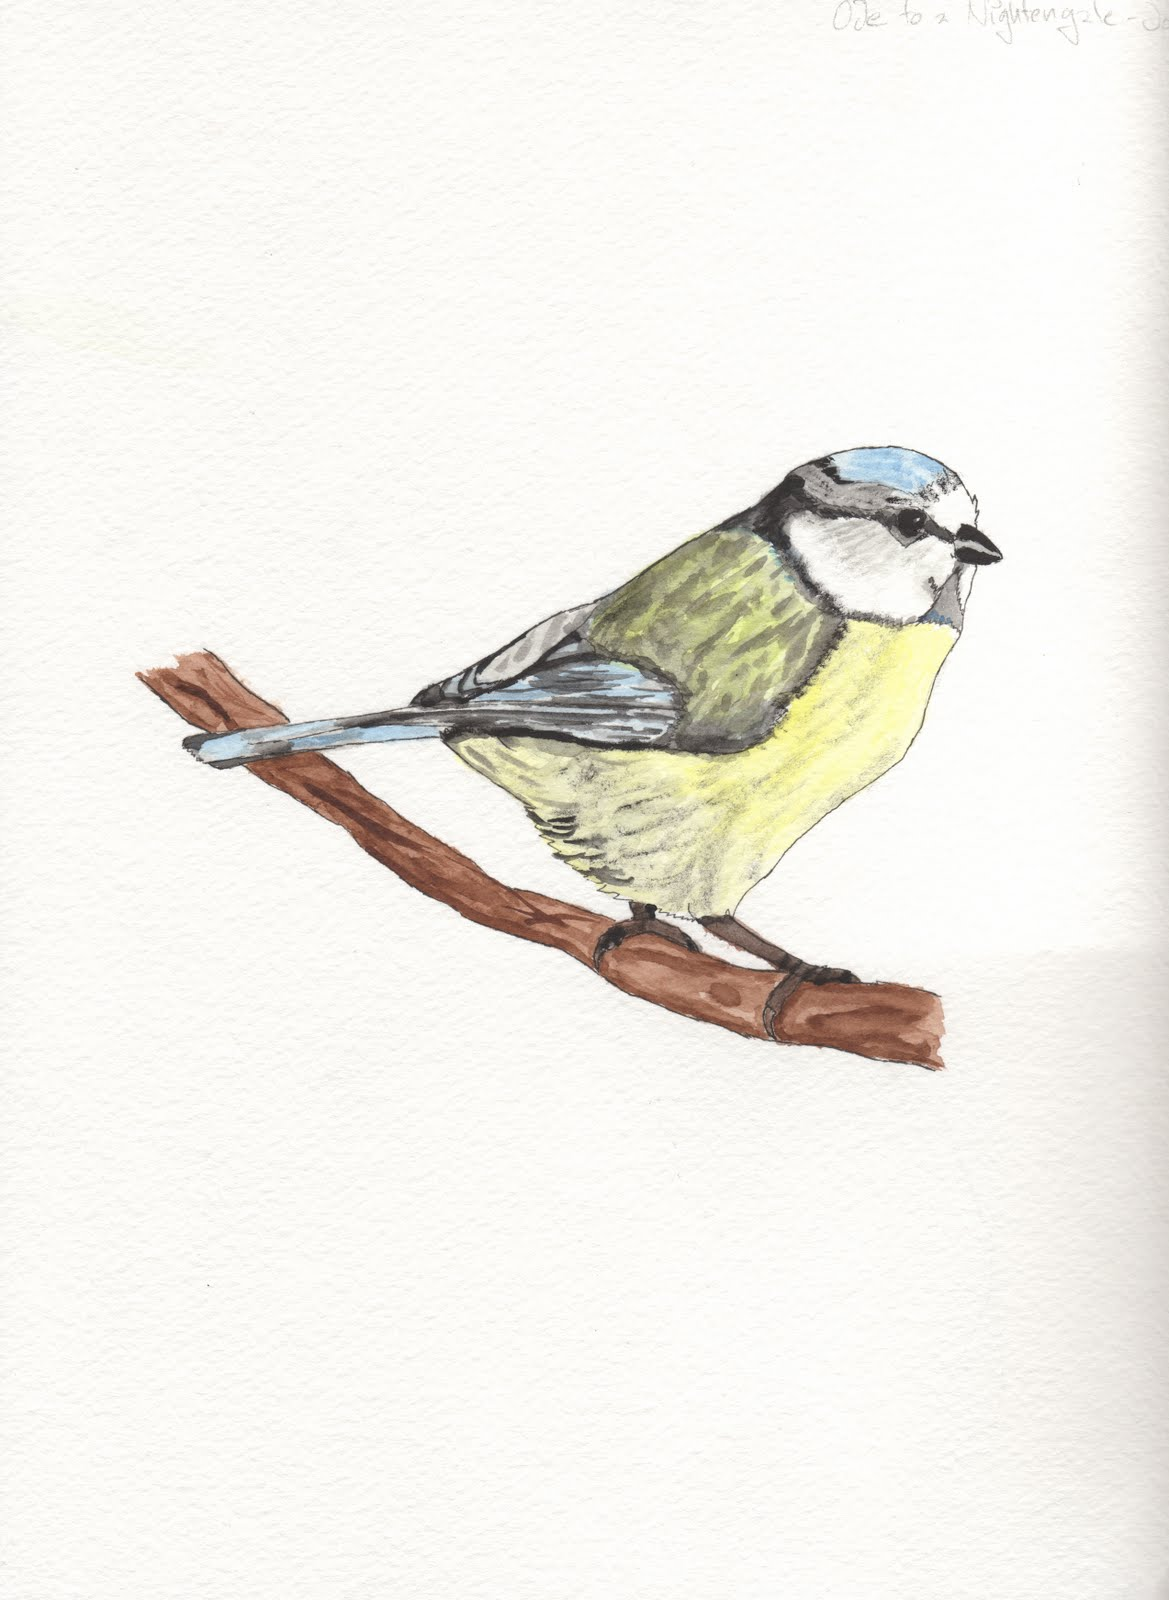 Ode to Nightingale Poem